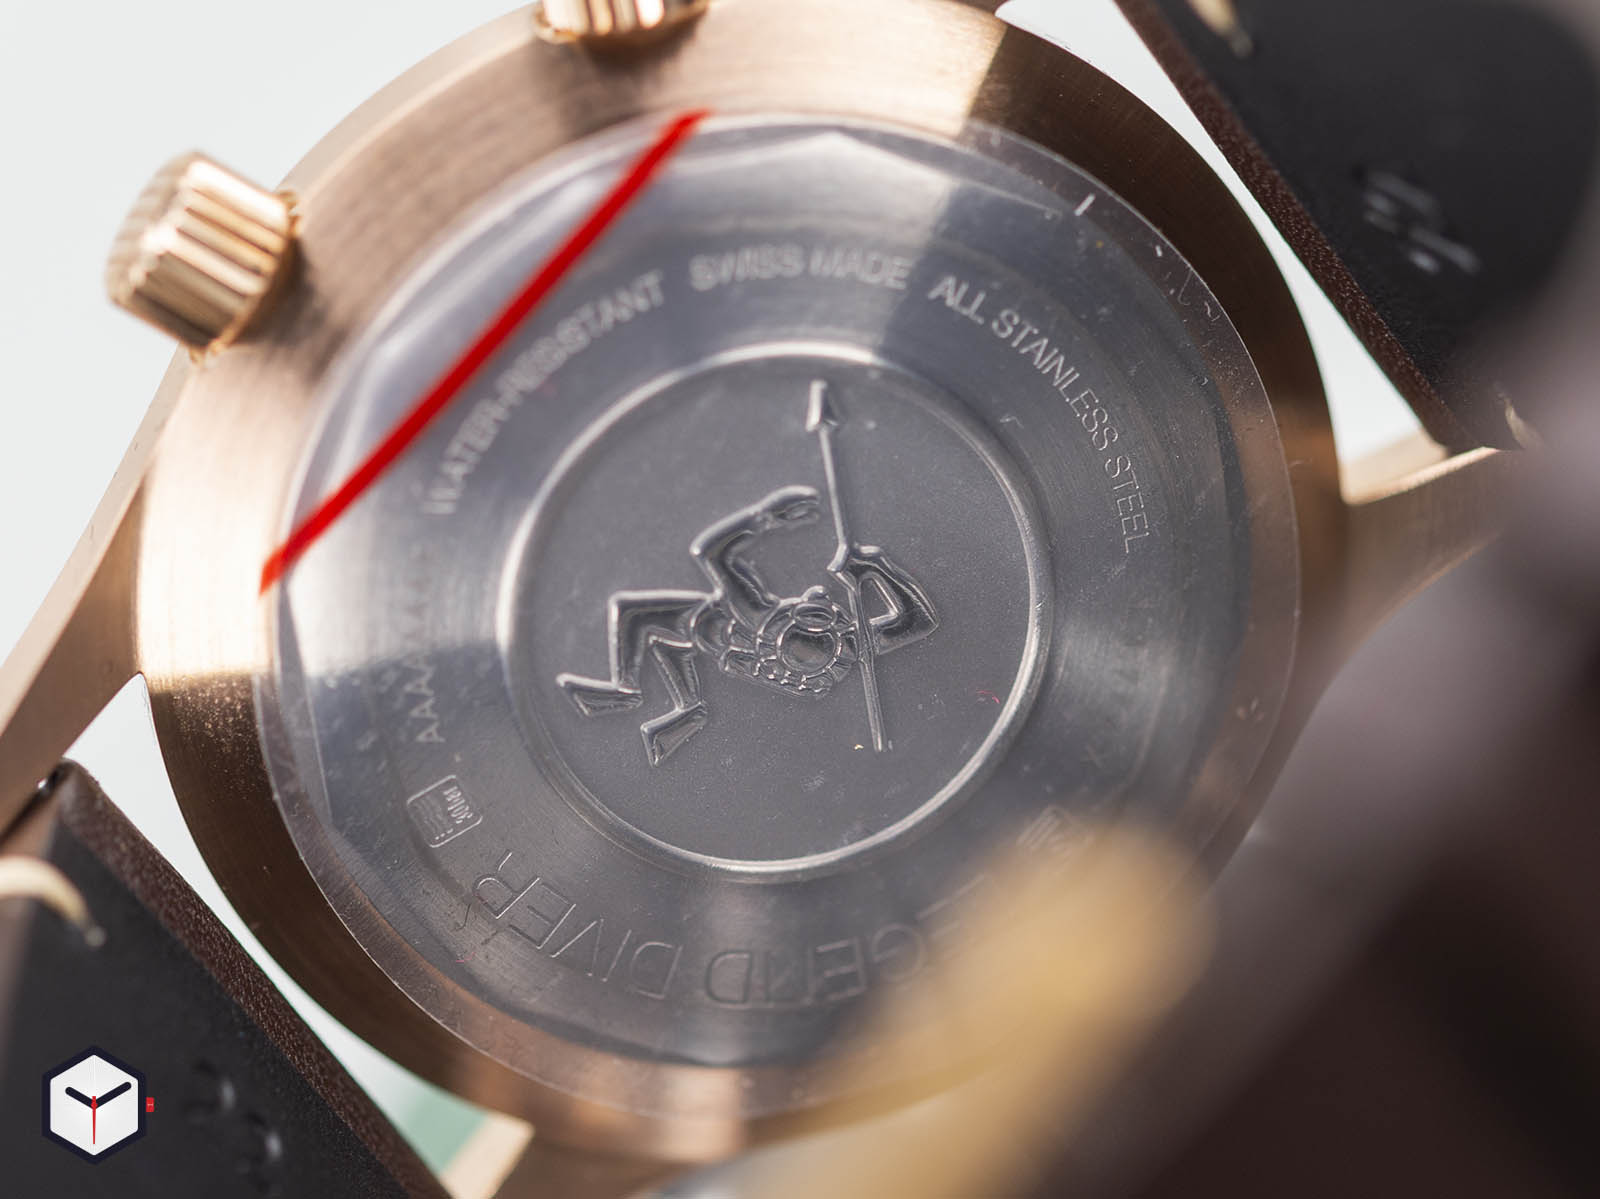 l3-774-1-50-2-longines-legend-diver-bronze-4.jpg